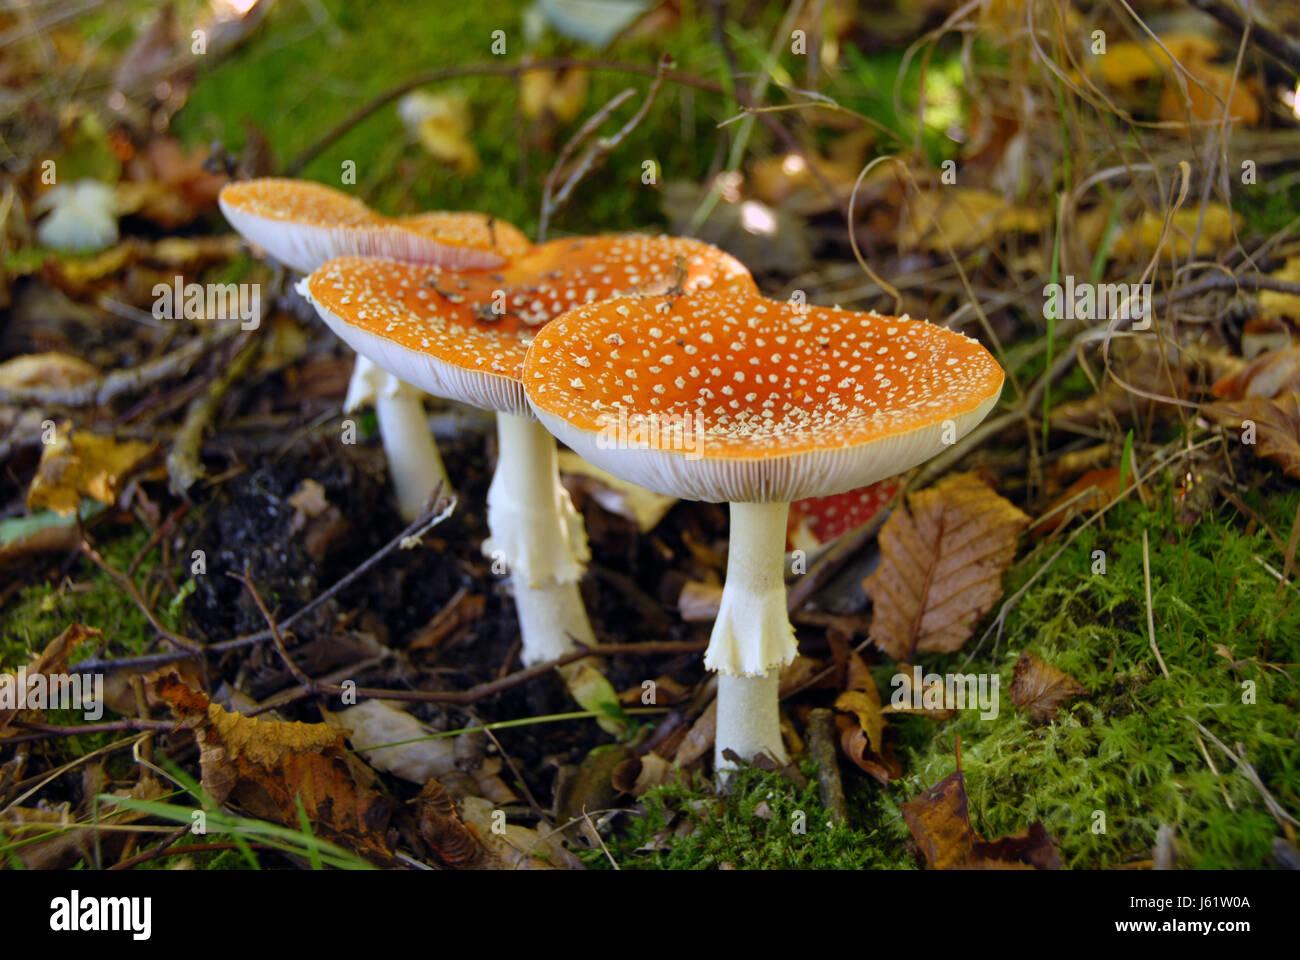 stool mushroom fungus toadstool toad fairies fairy danger pine leaves magical - Stock Image